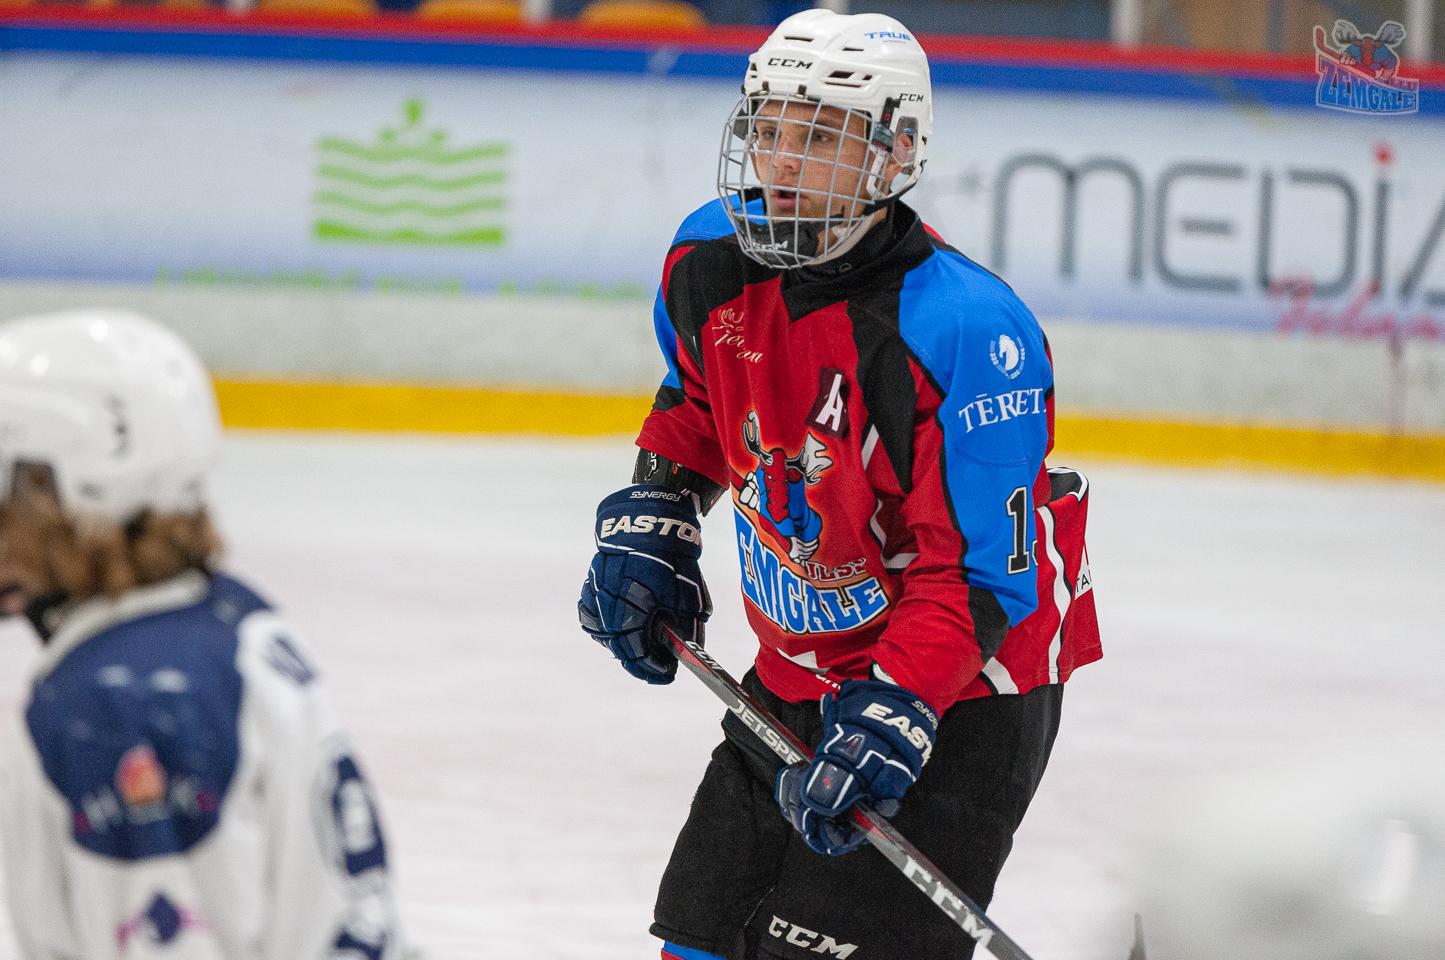 Jelgavas hokeja skola JLSS U17 - Venta 2002 14092019-10